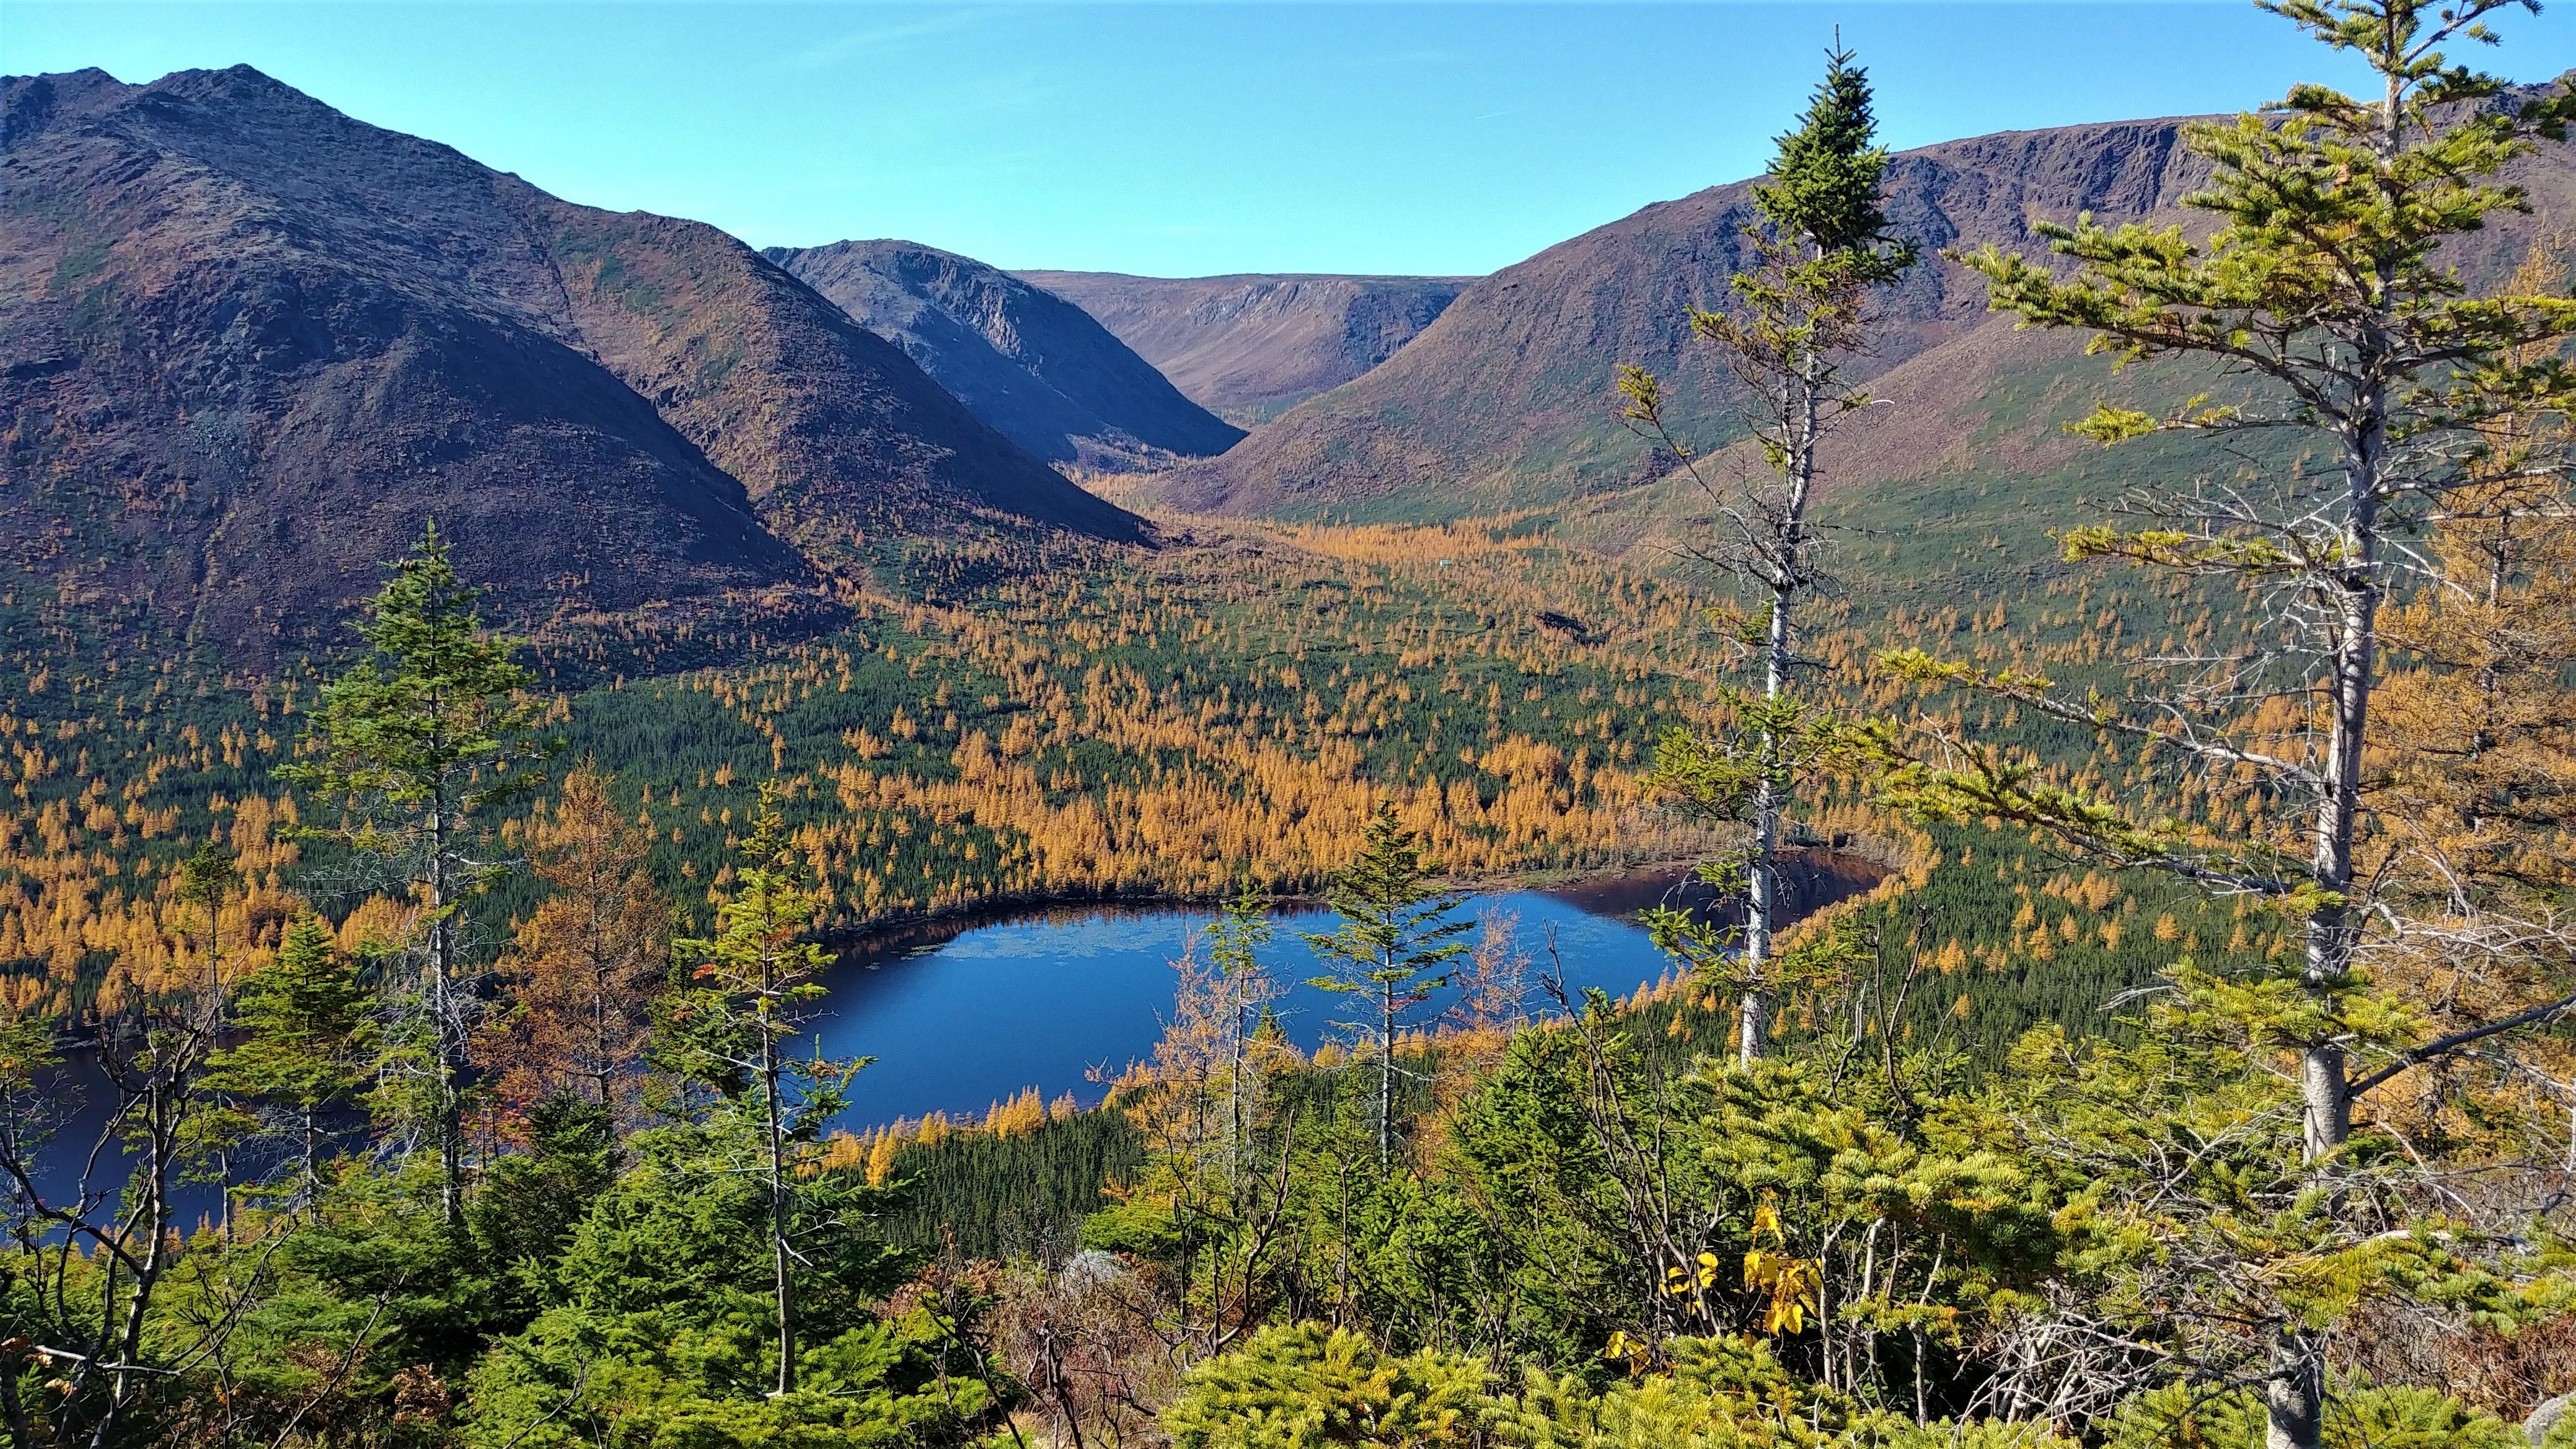 mont olivine parc gaspesie randonnee quebec automne blog voyage canada road-trip arpenter le chemin